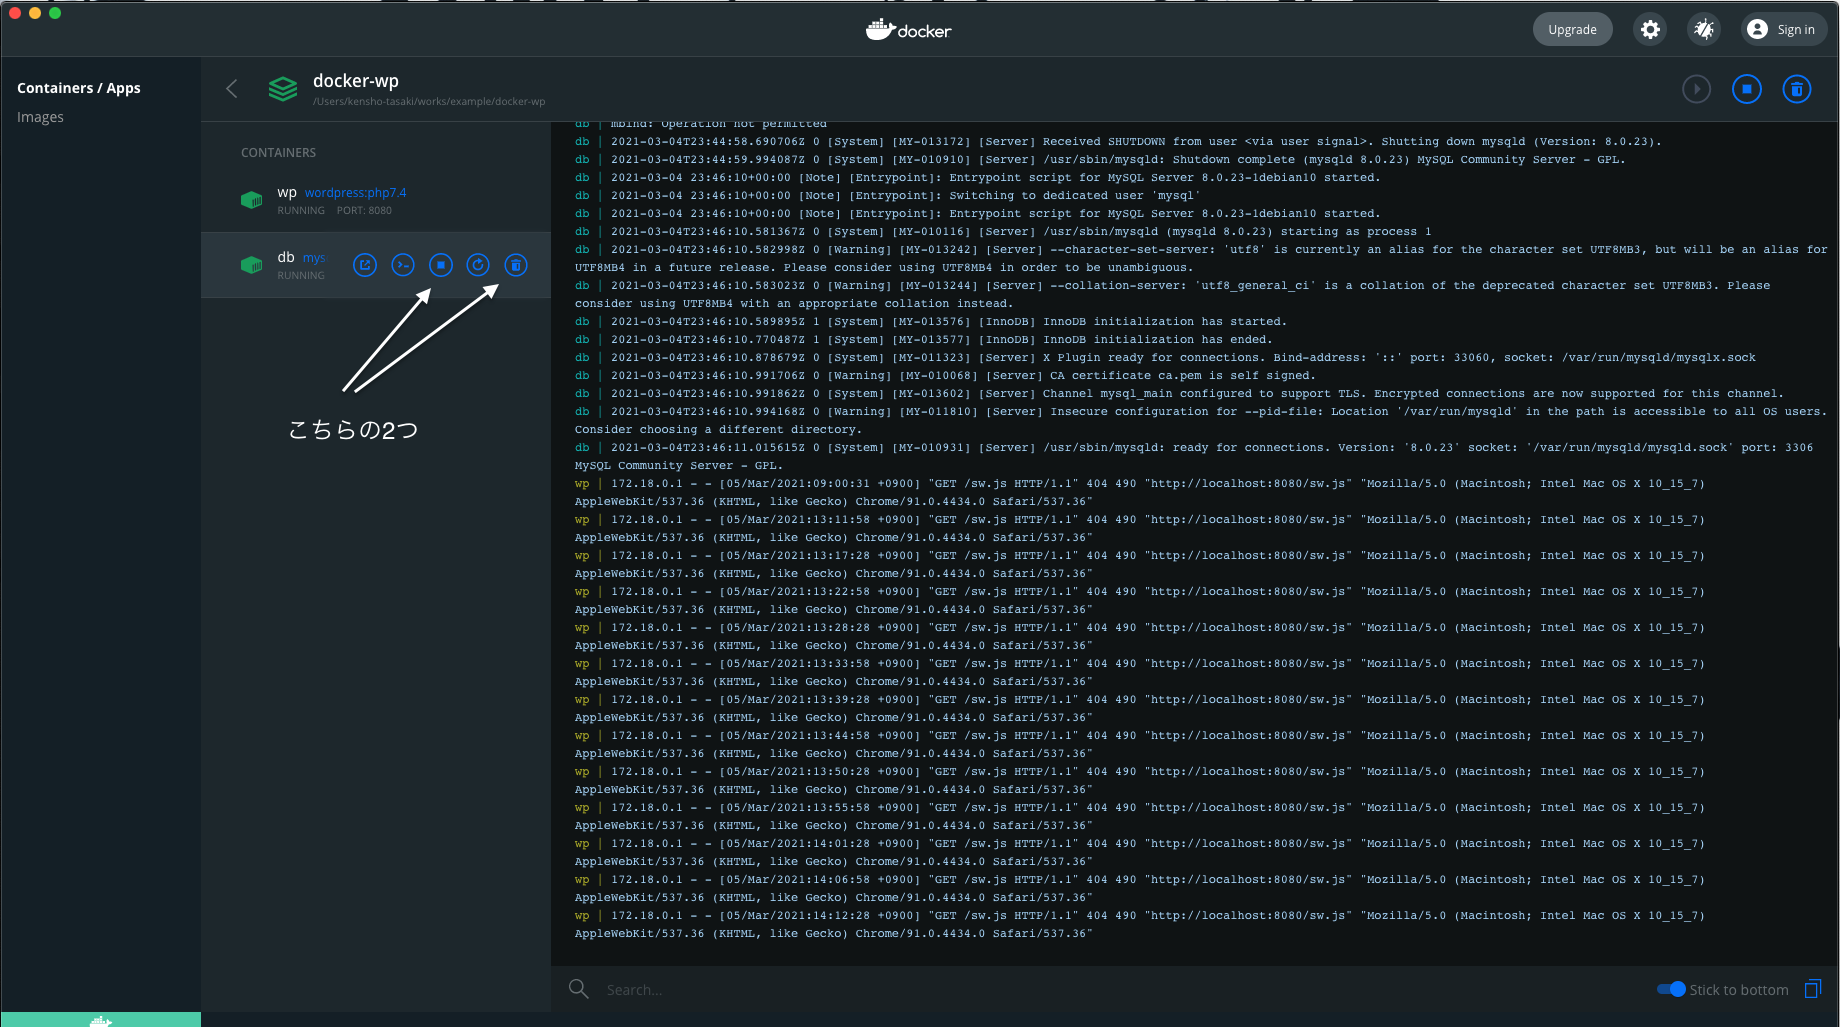 Docker Desktopでのコンテナごとの削除